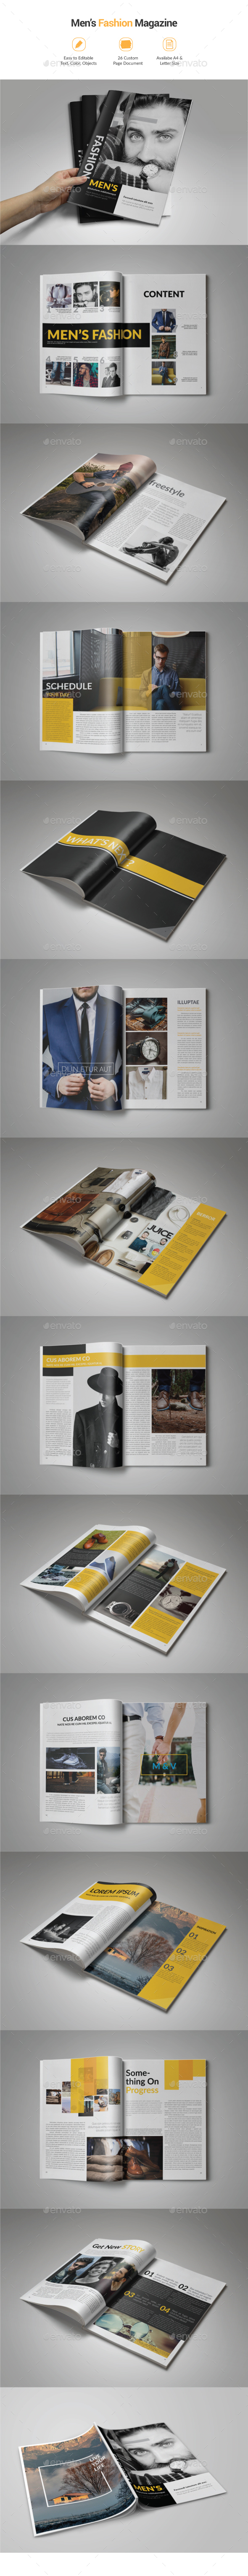 Men's Fashion Magazine - Magazines Print Templates